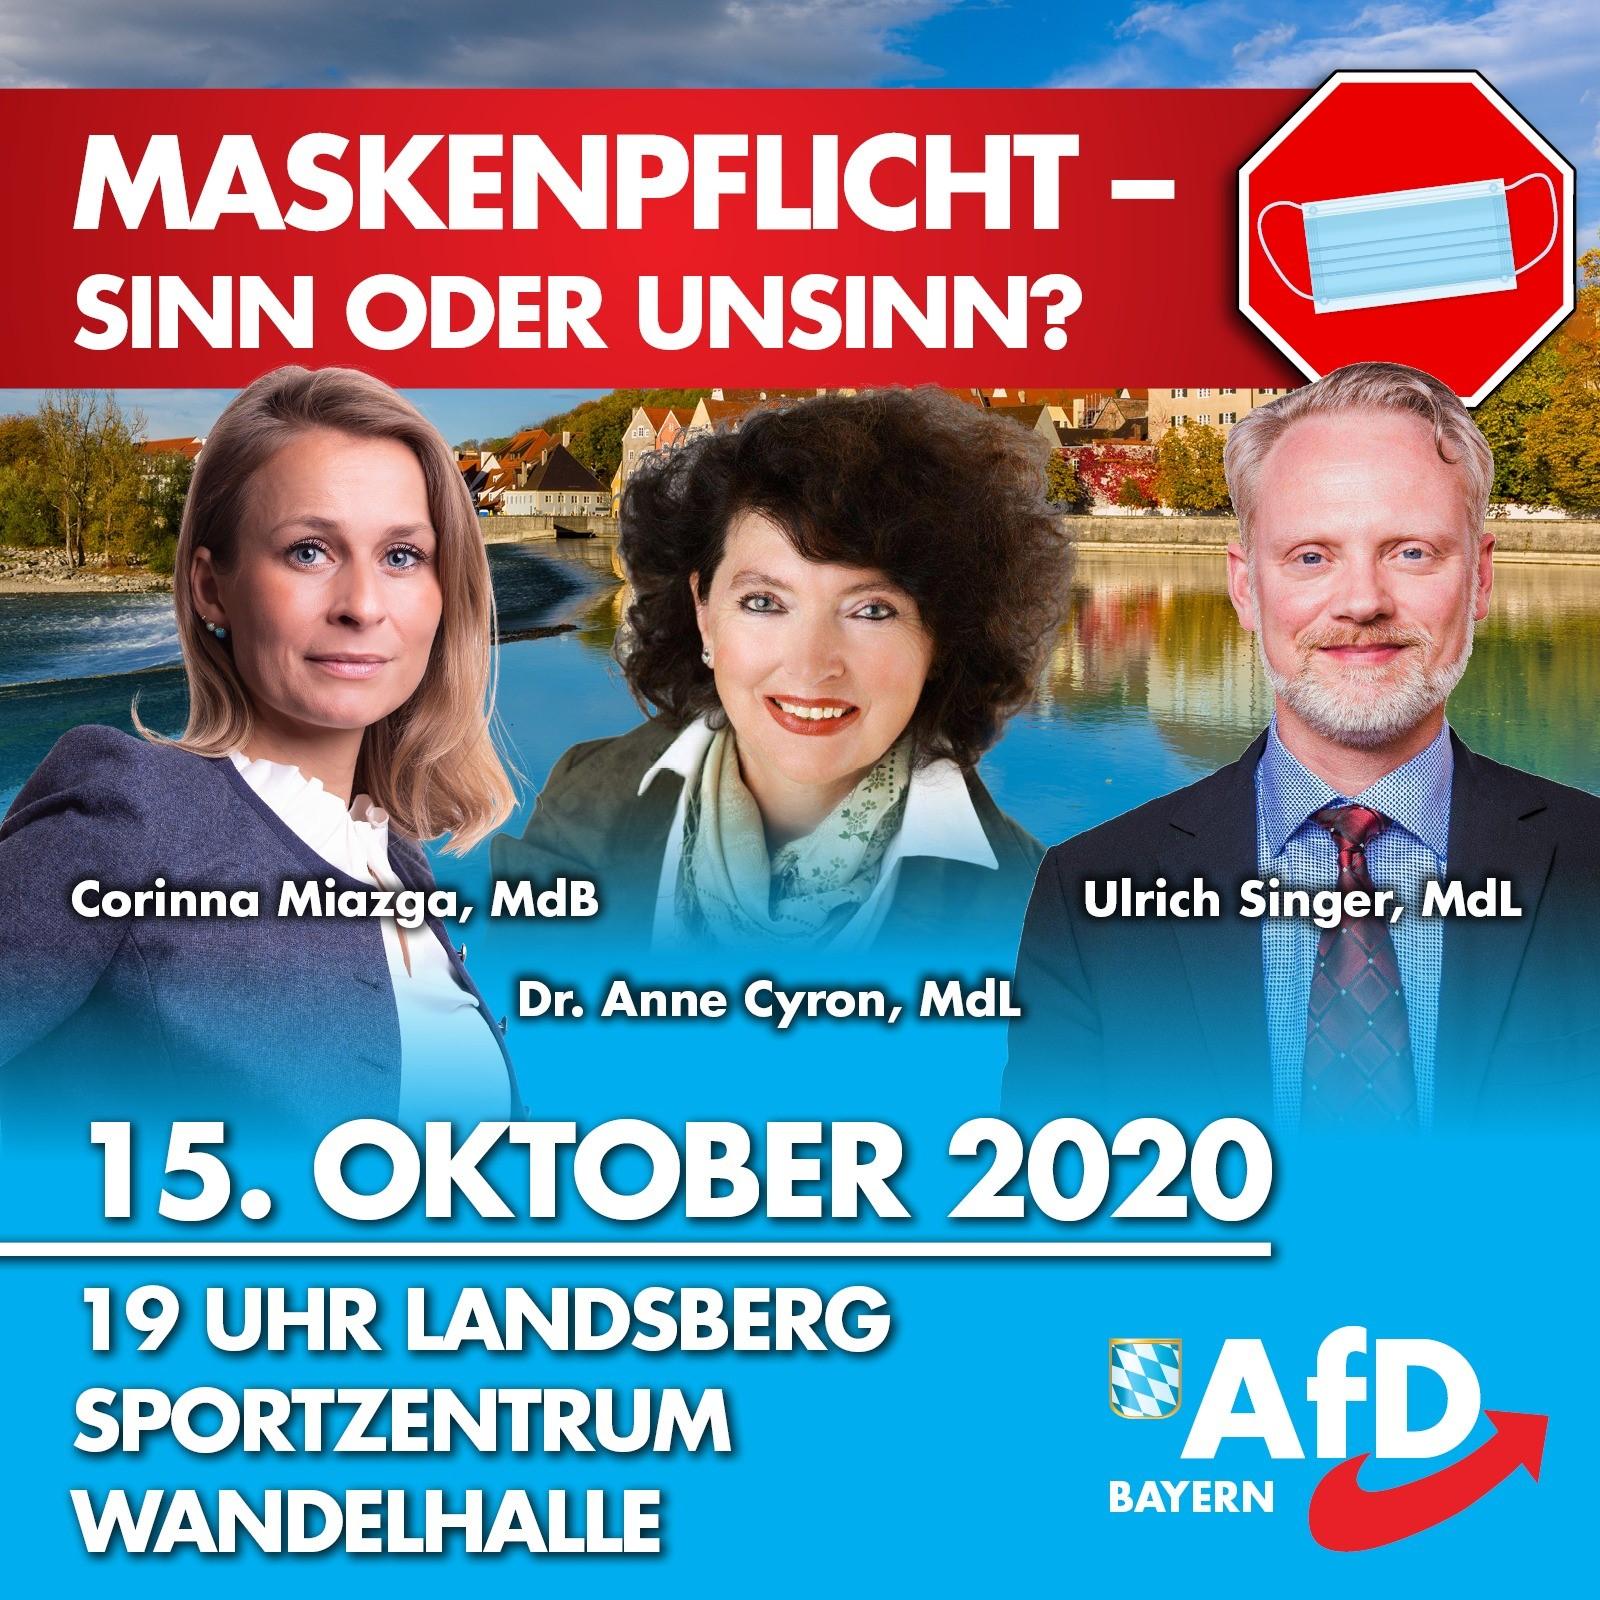 Veranstaltung in Landsberg am Lech